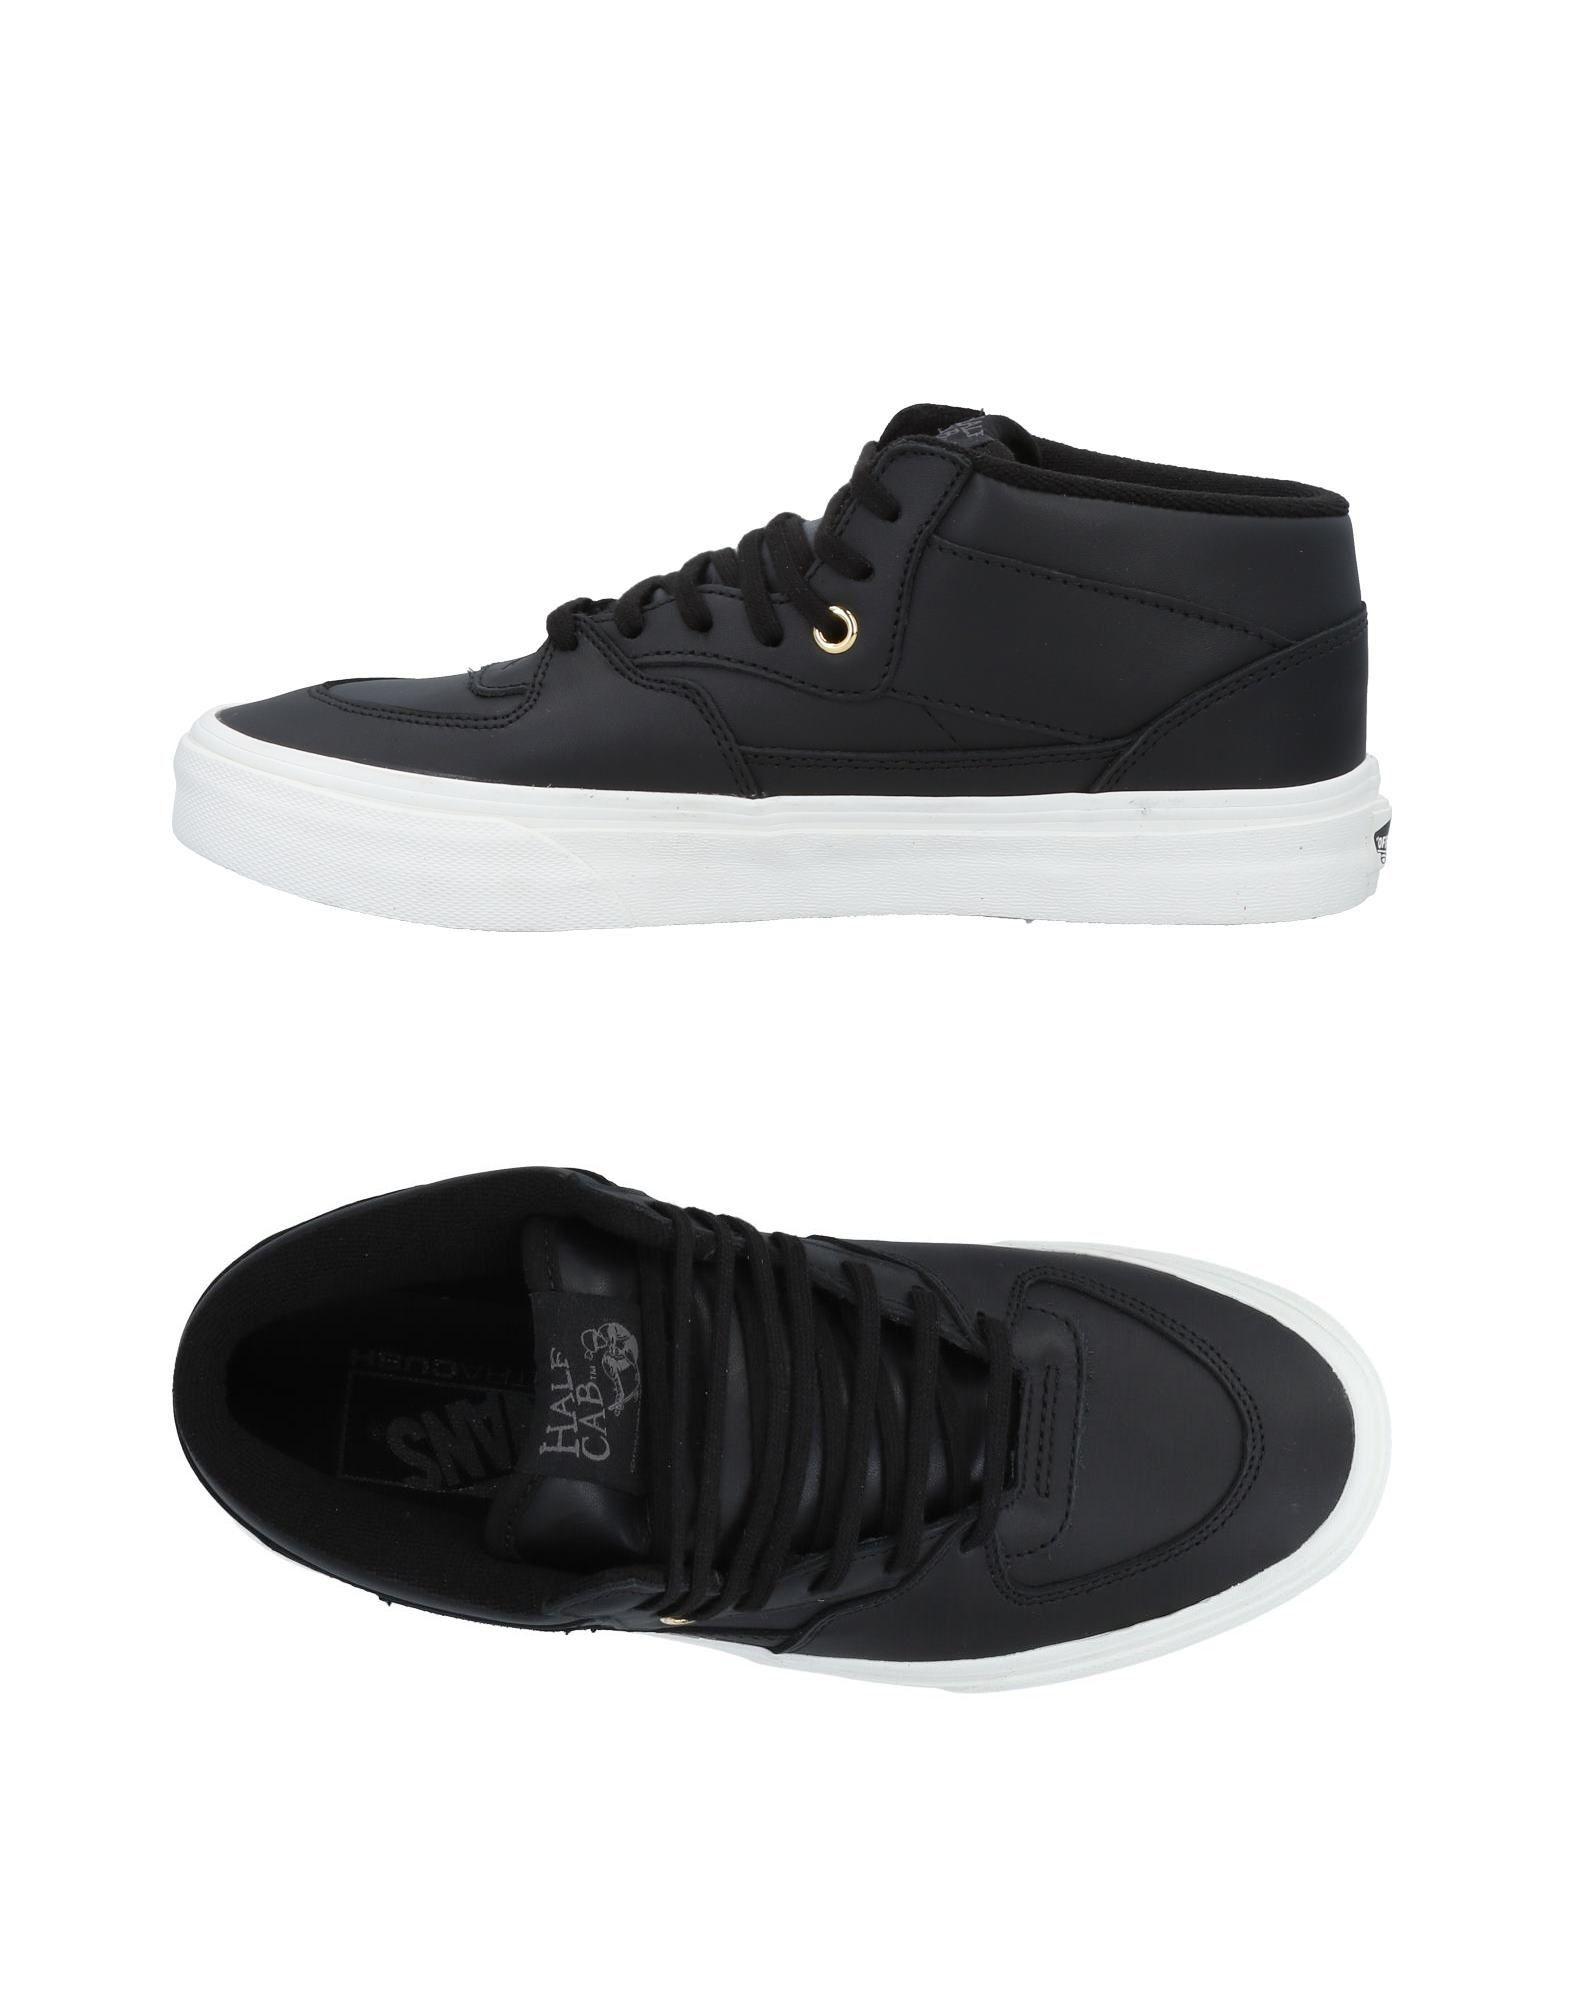 Moda Sneakers Vans Donna Donna Vans - 11494486JF ecc0a0